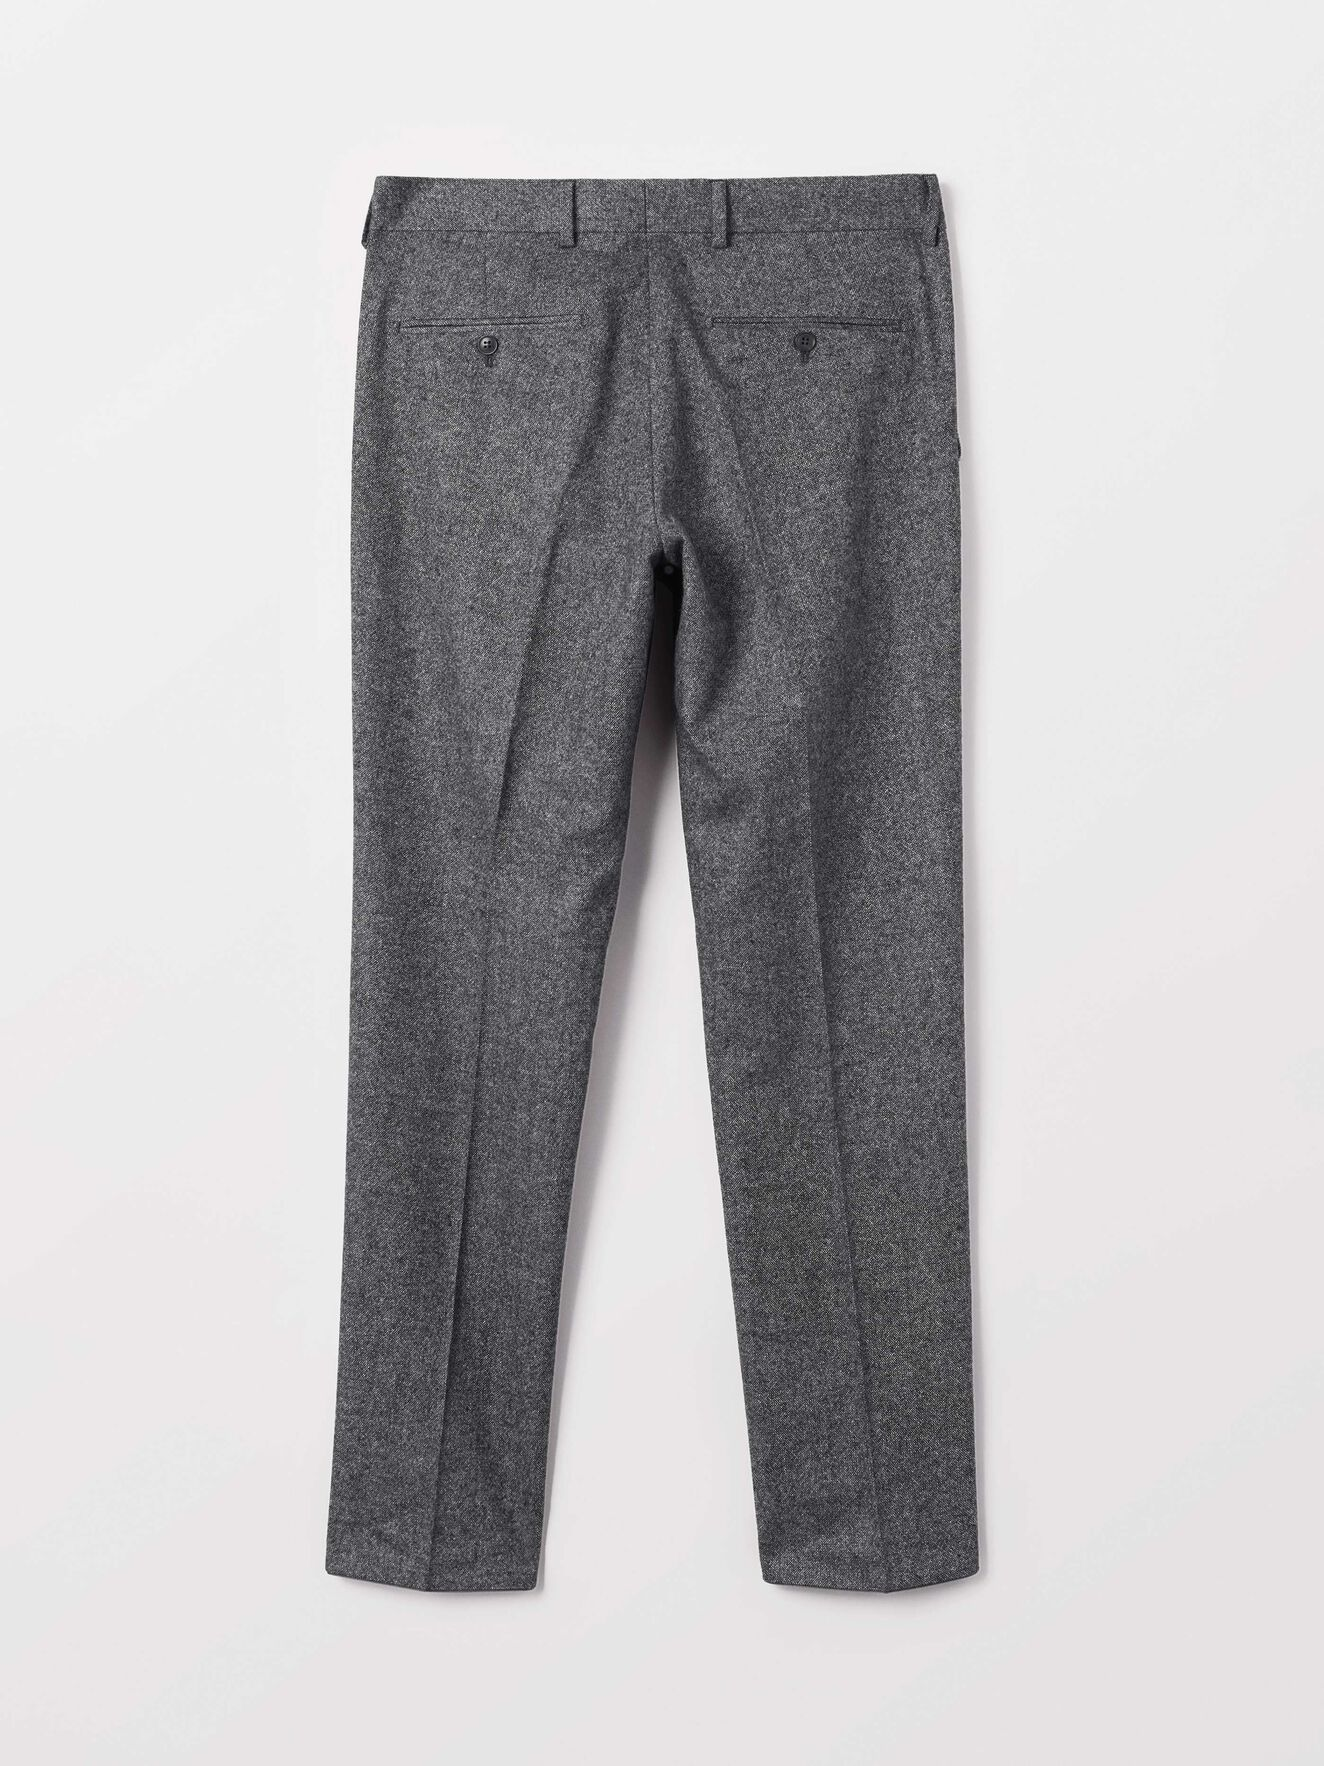 Tordon Trousers in Light grey melange from Tiger of Sweden